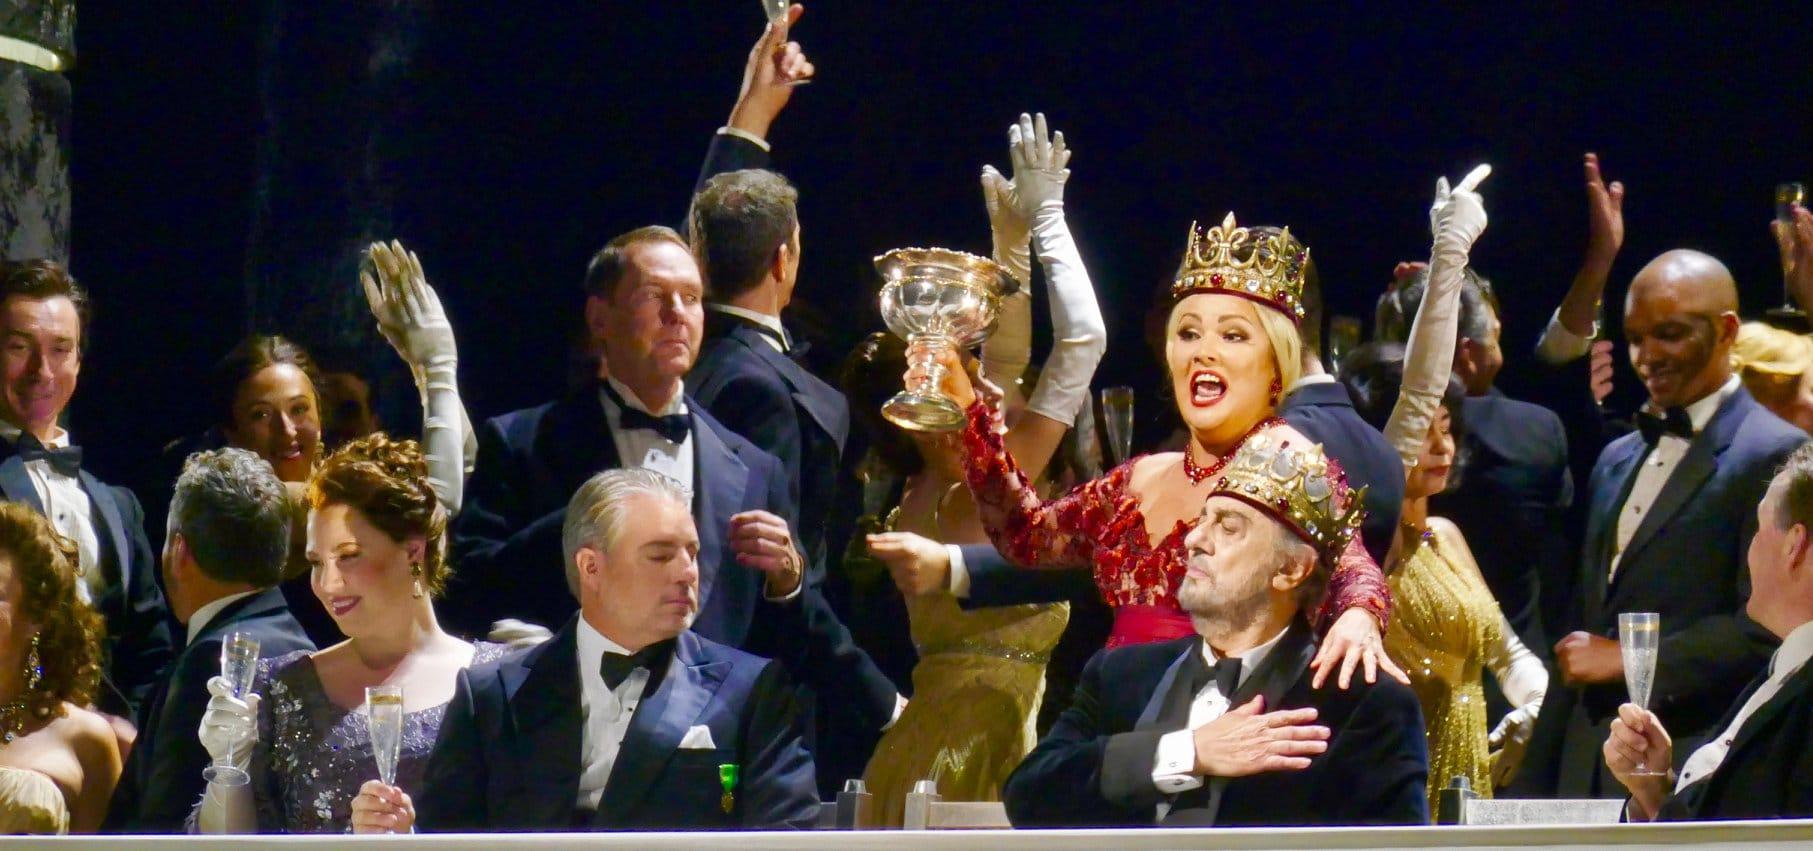 Exclusive: Last shot of Placido Domingo at the Met